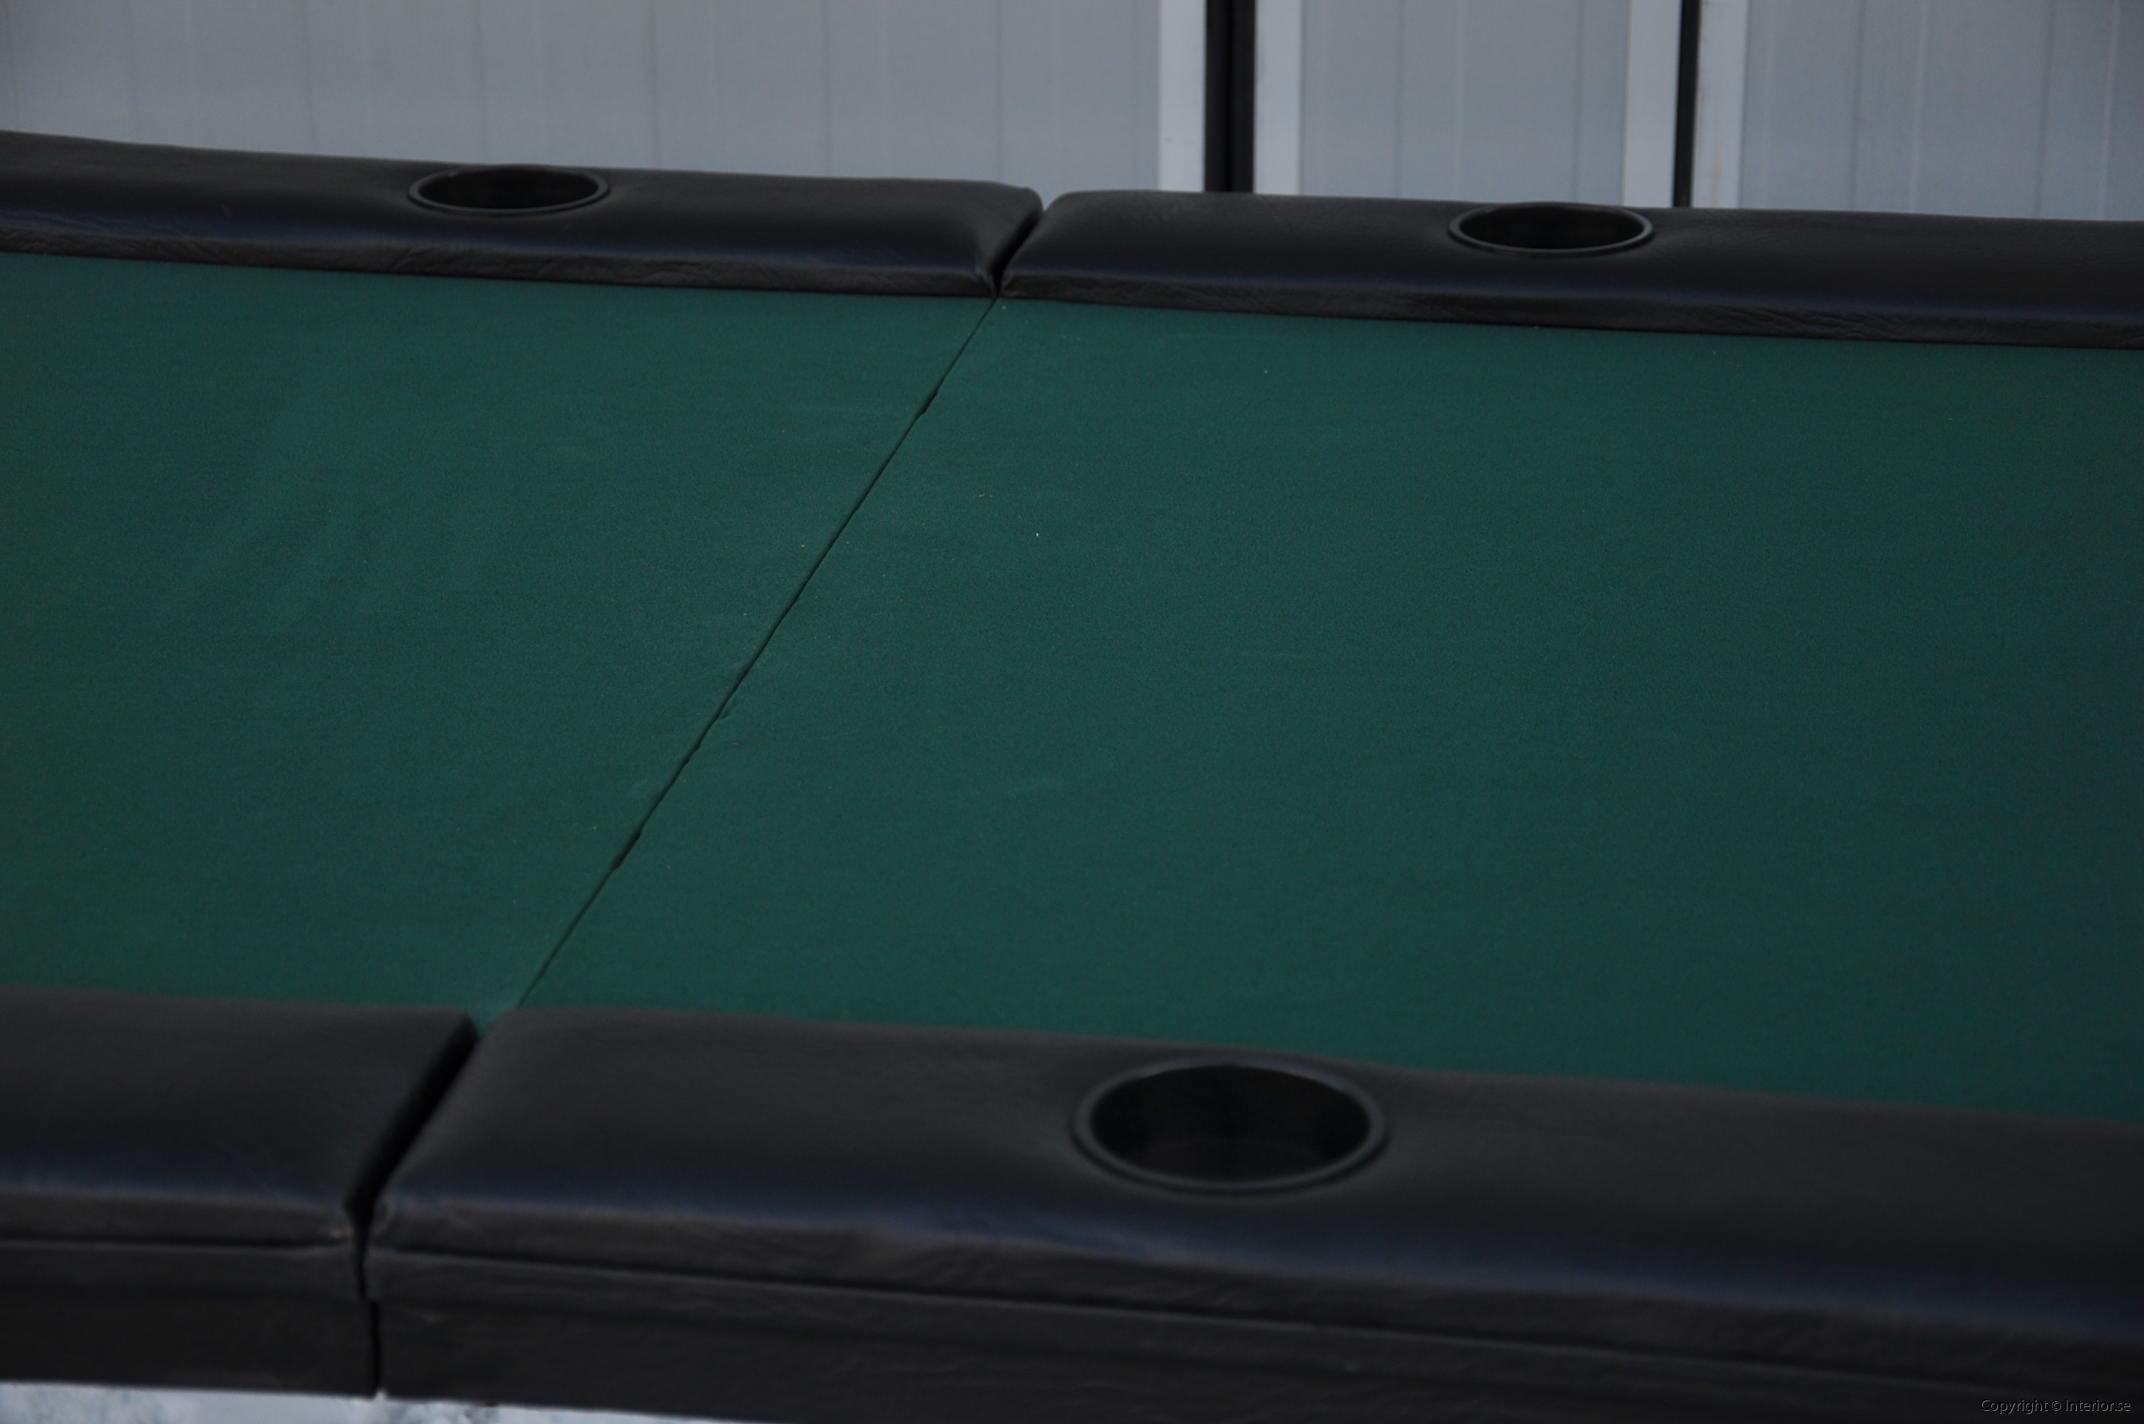 Hyra spelbord hyr pokerbord texas hold em blackjack pokerbord stockholm hyra spel (7)